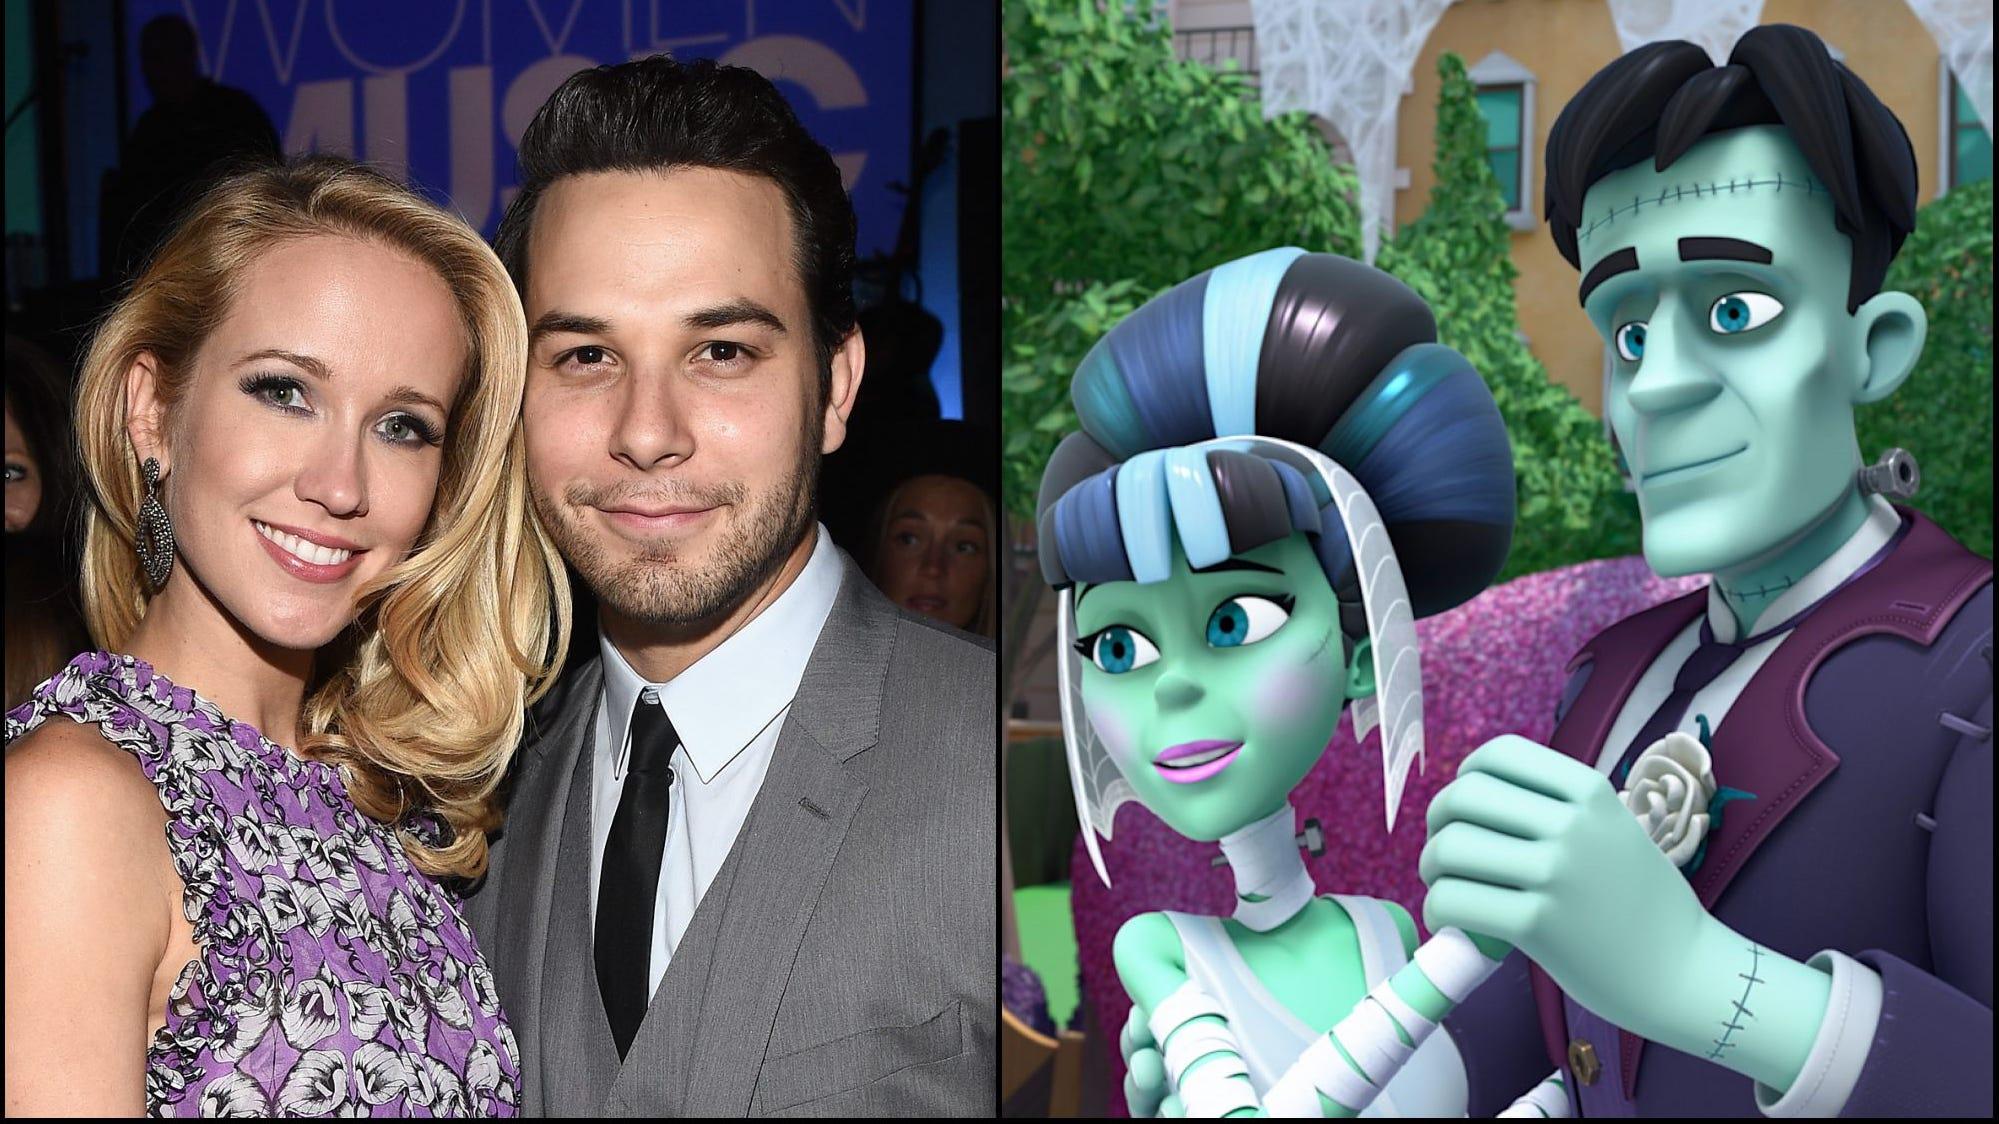 Sneak peek: 'Pitch Perfect' couple Anna Camp and Skylar Astin on Disney's 'Vampirina'